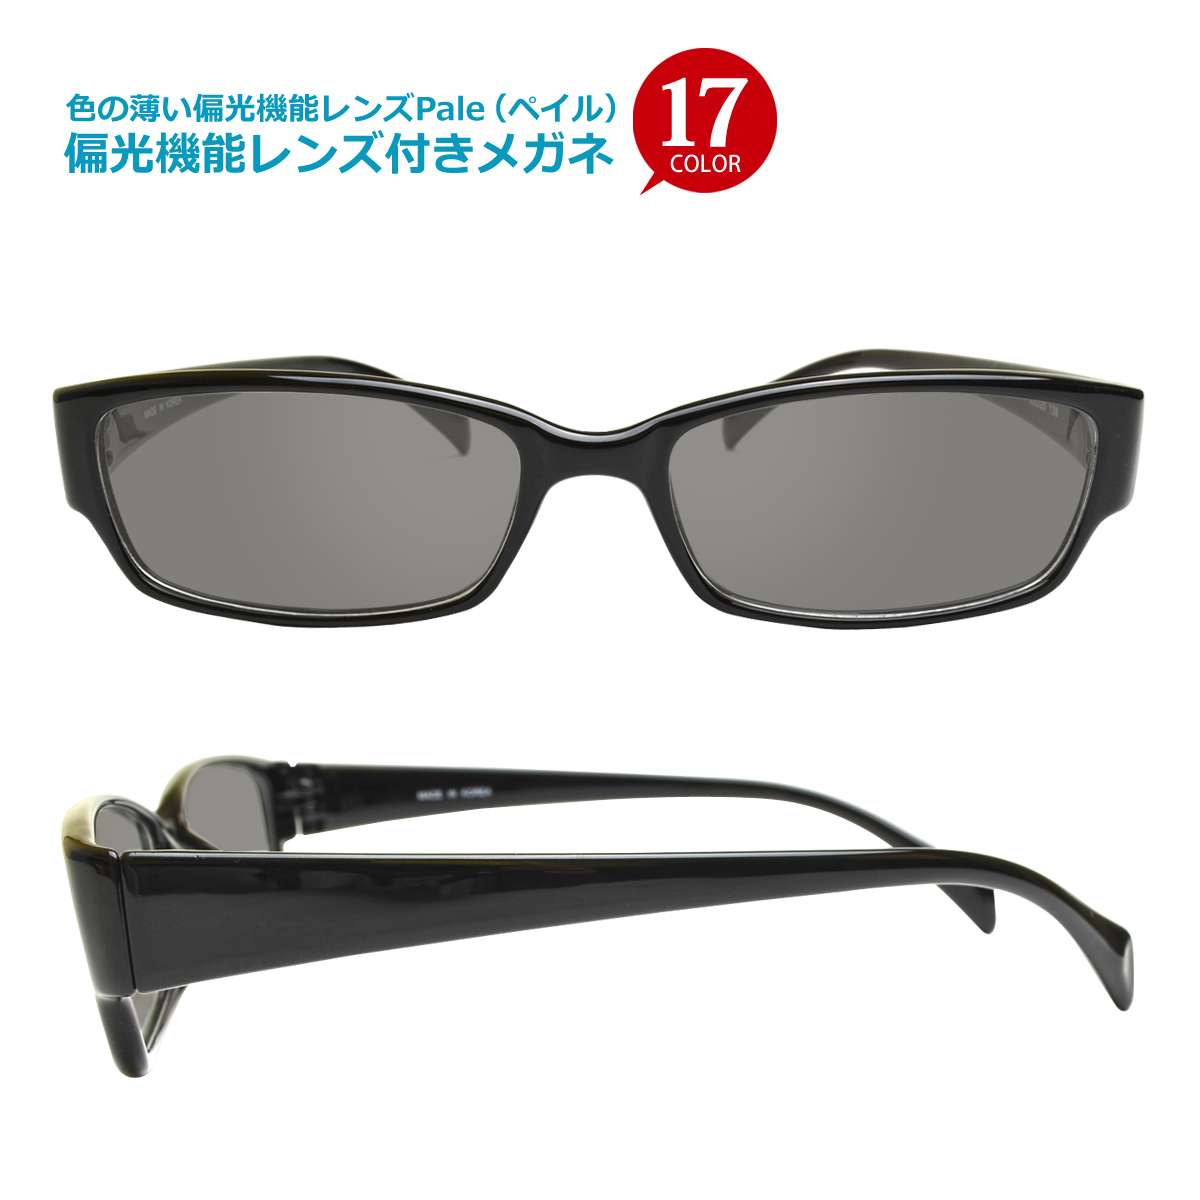 Made in Japanの技術が生んだ 色の薄い偏光機能レンズ 偏光機能レンズ付きメガネ 乱視対応 Lune-0001 フレームタイプ スクエア ショップ 度入り 本物